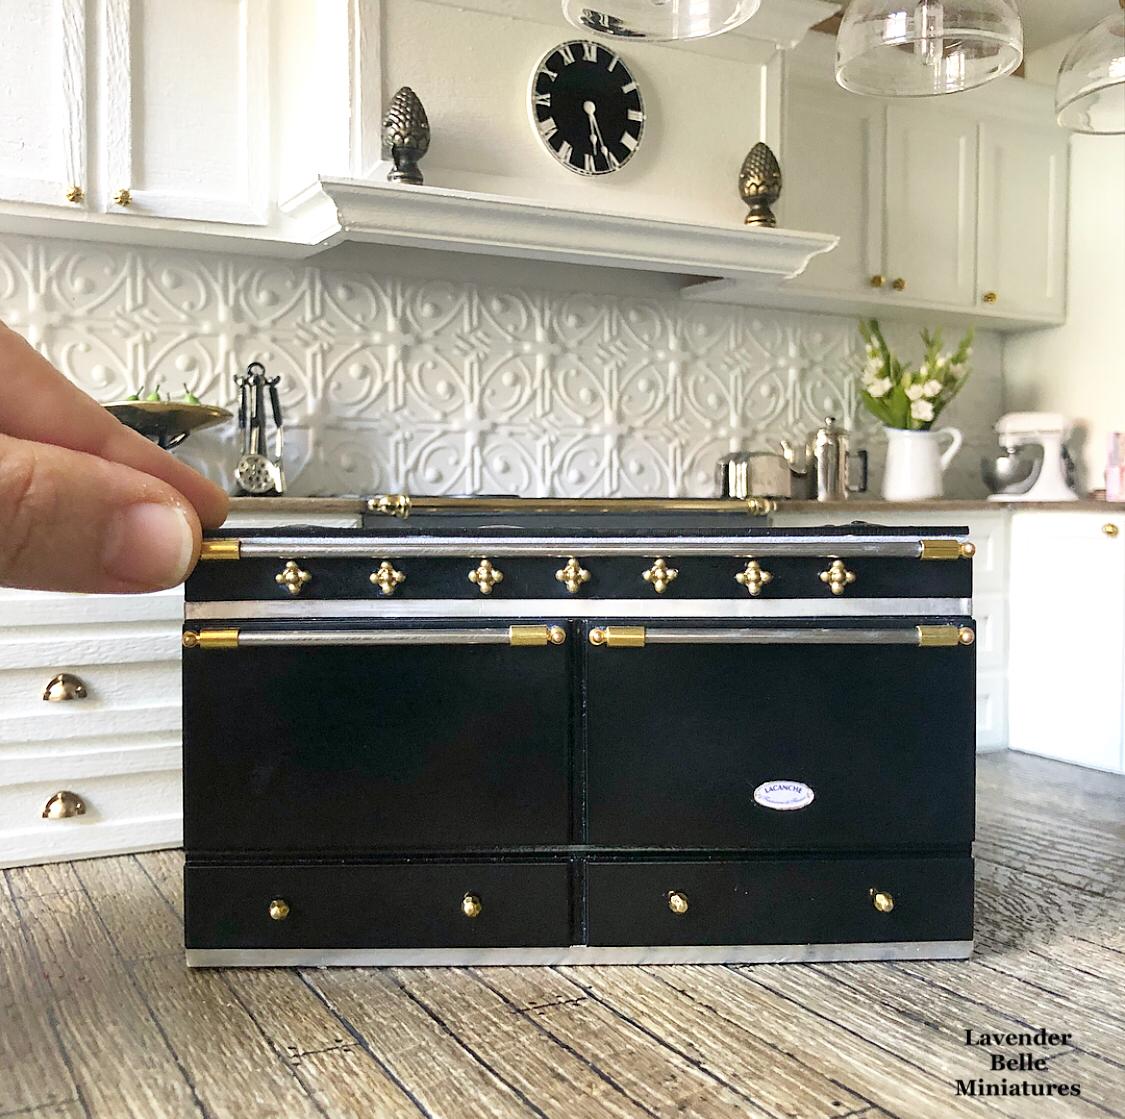 Miniature Lacanche stove 🖤 | Miniature kitchen, Miniatures ...